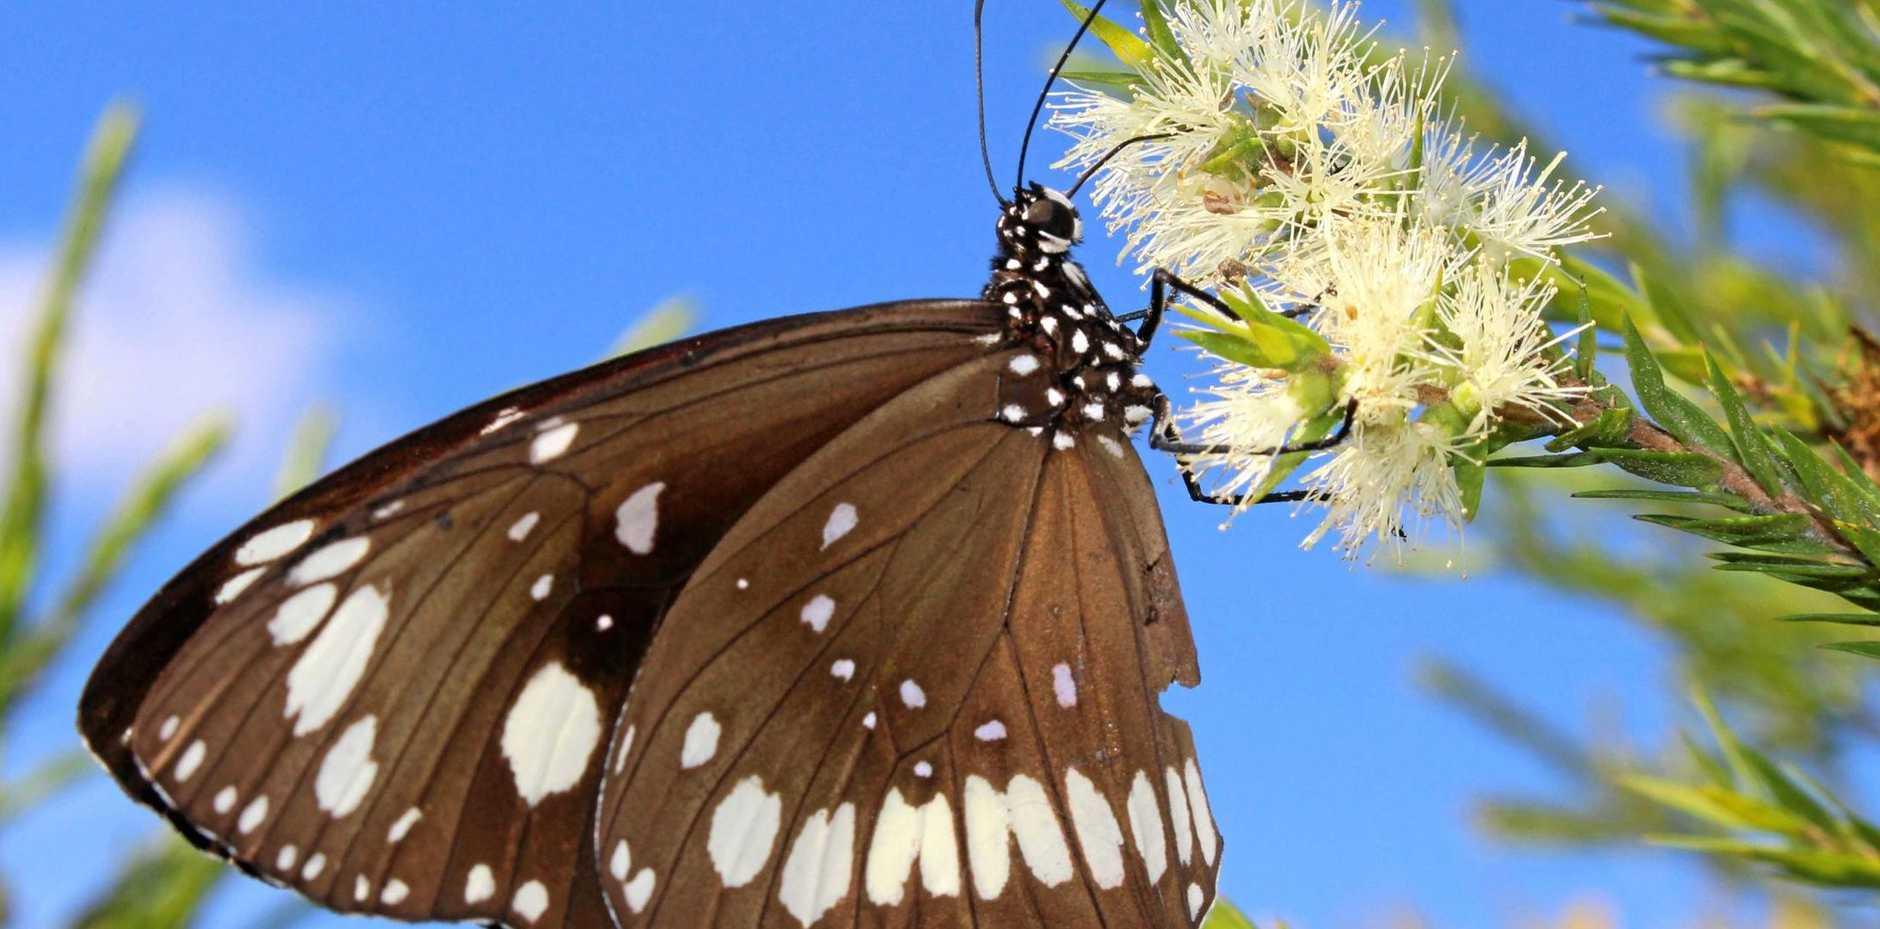 An oeander butterfly drinking nectar.